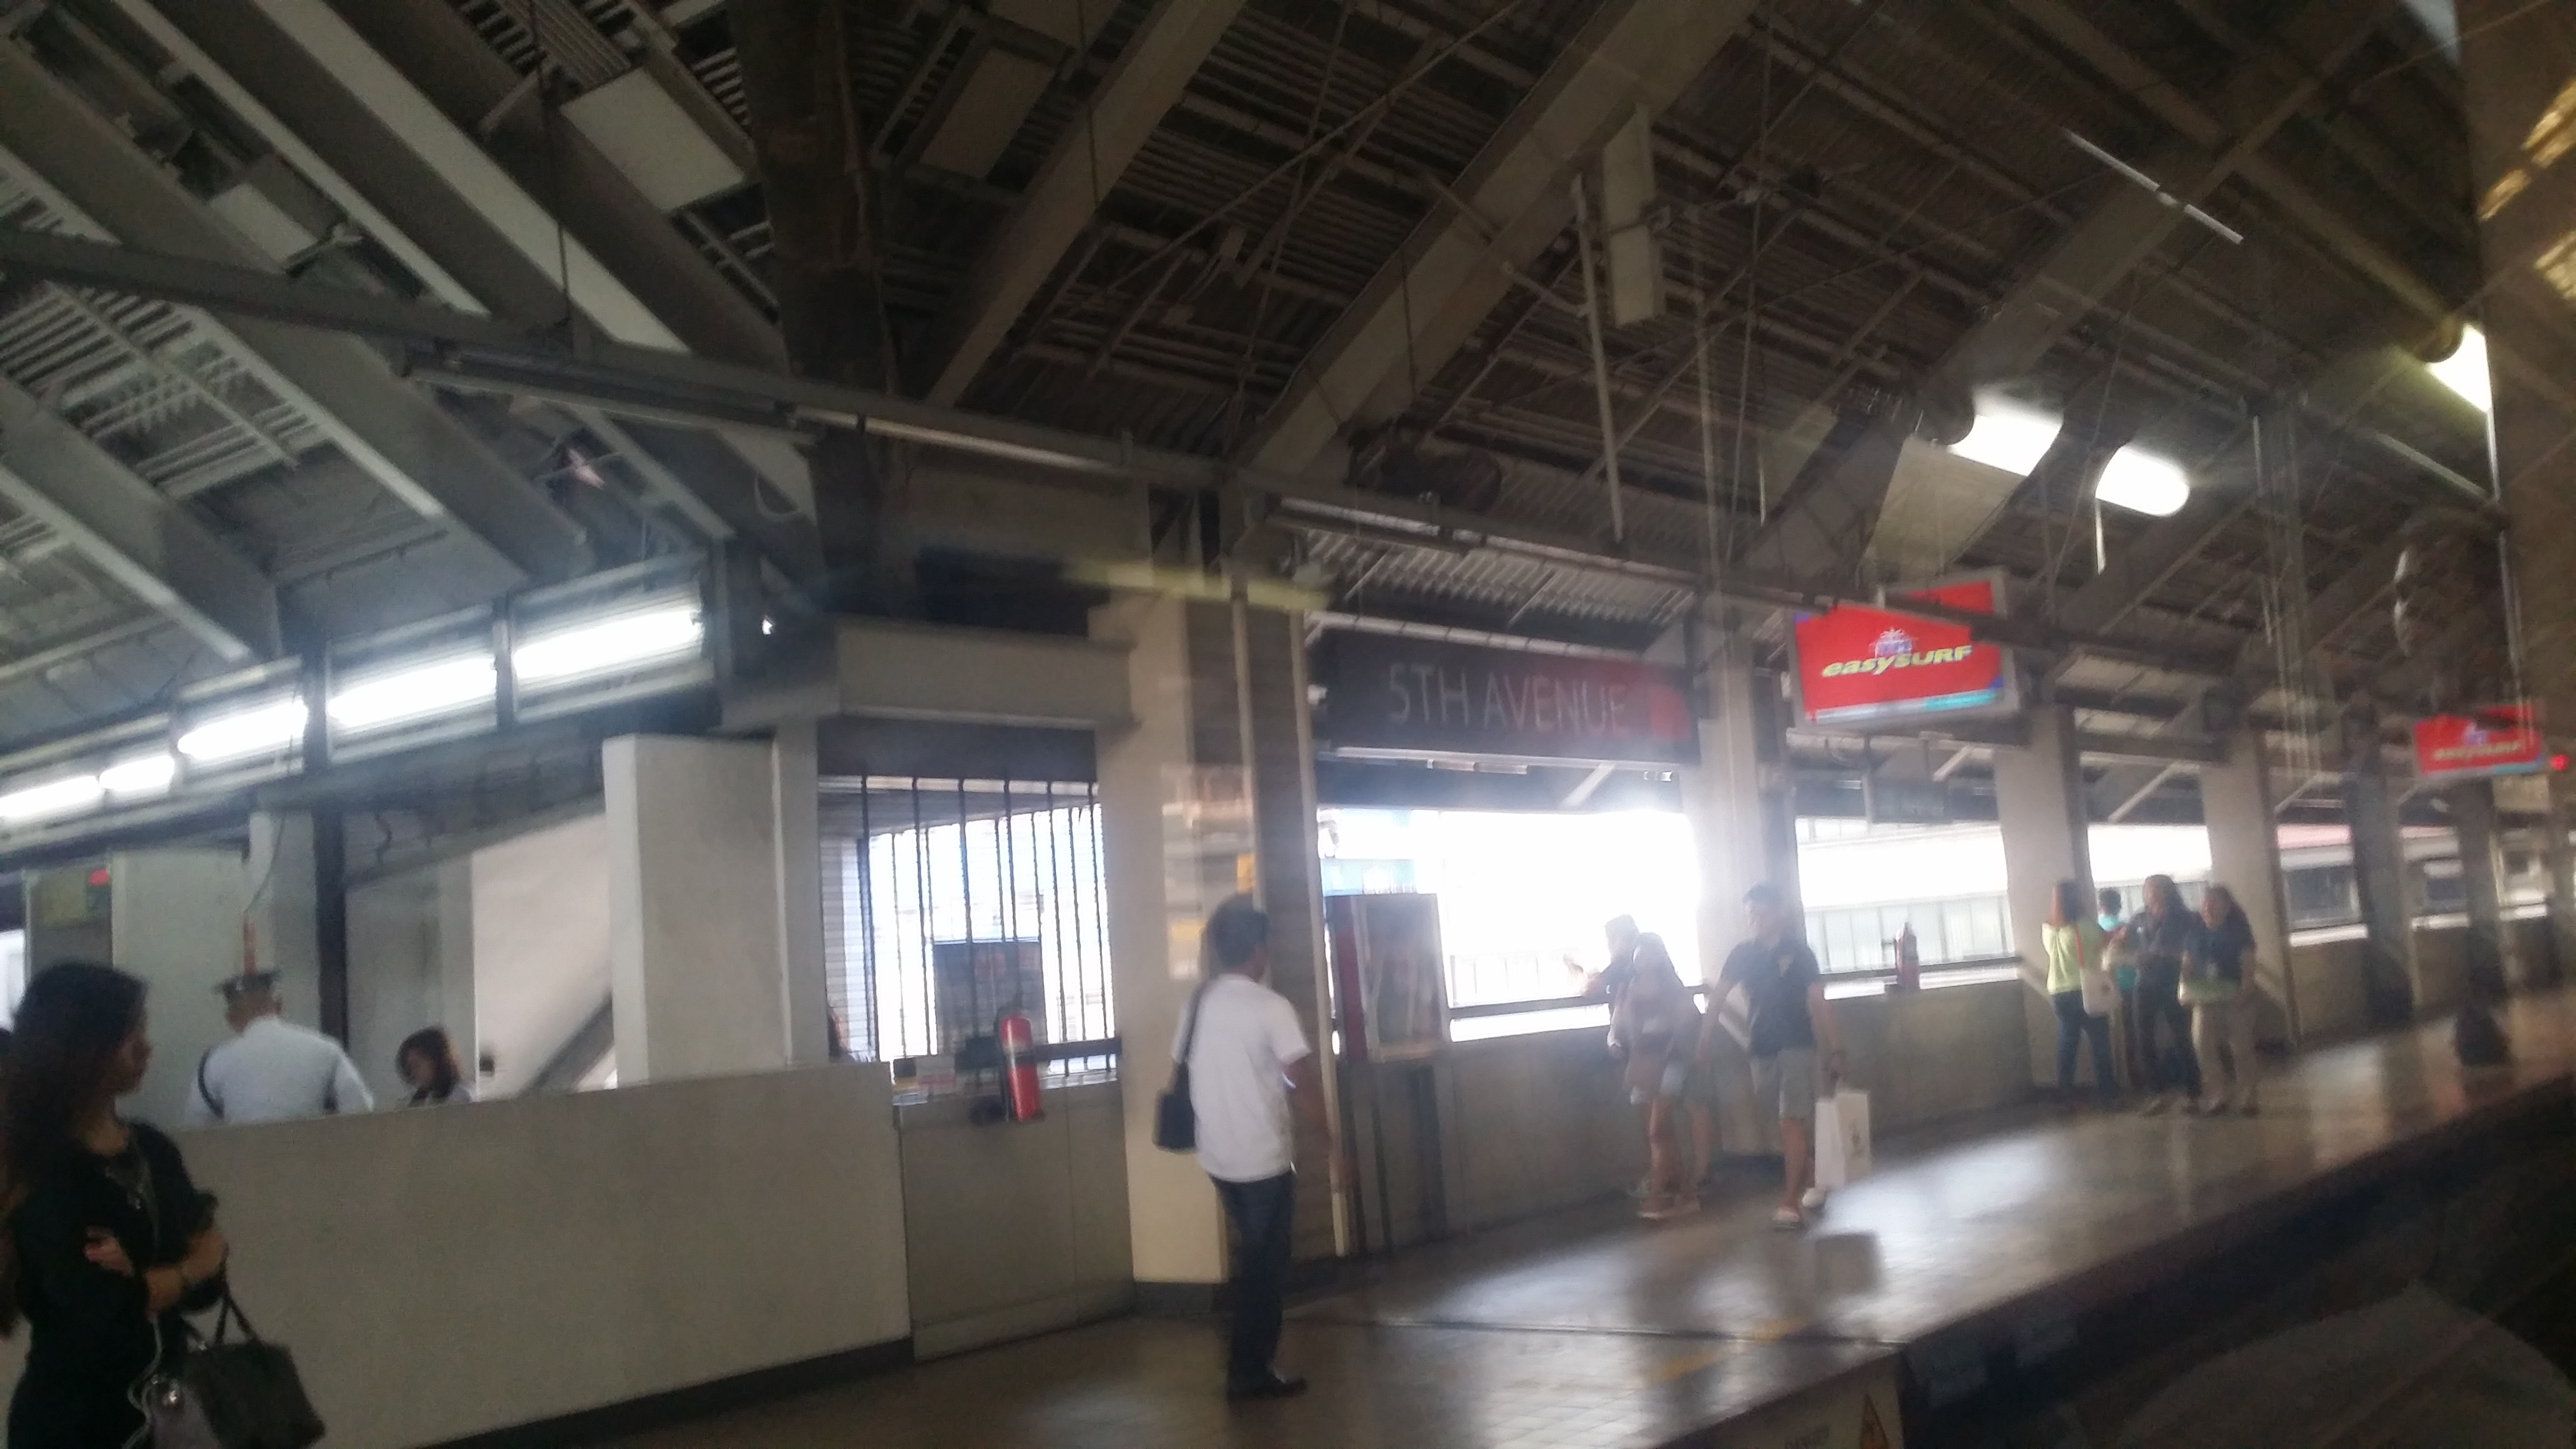 5th Avenue Station Lrt Wikipedia